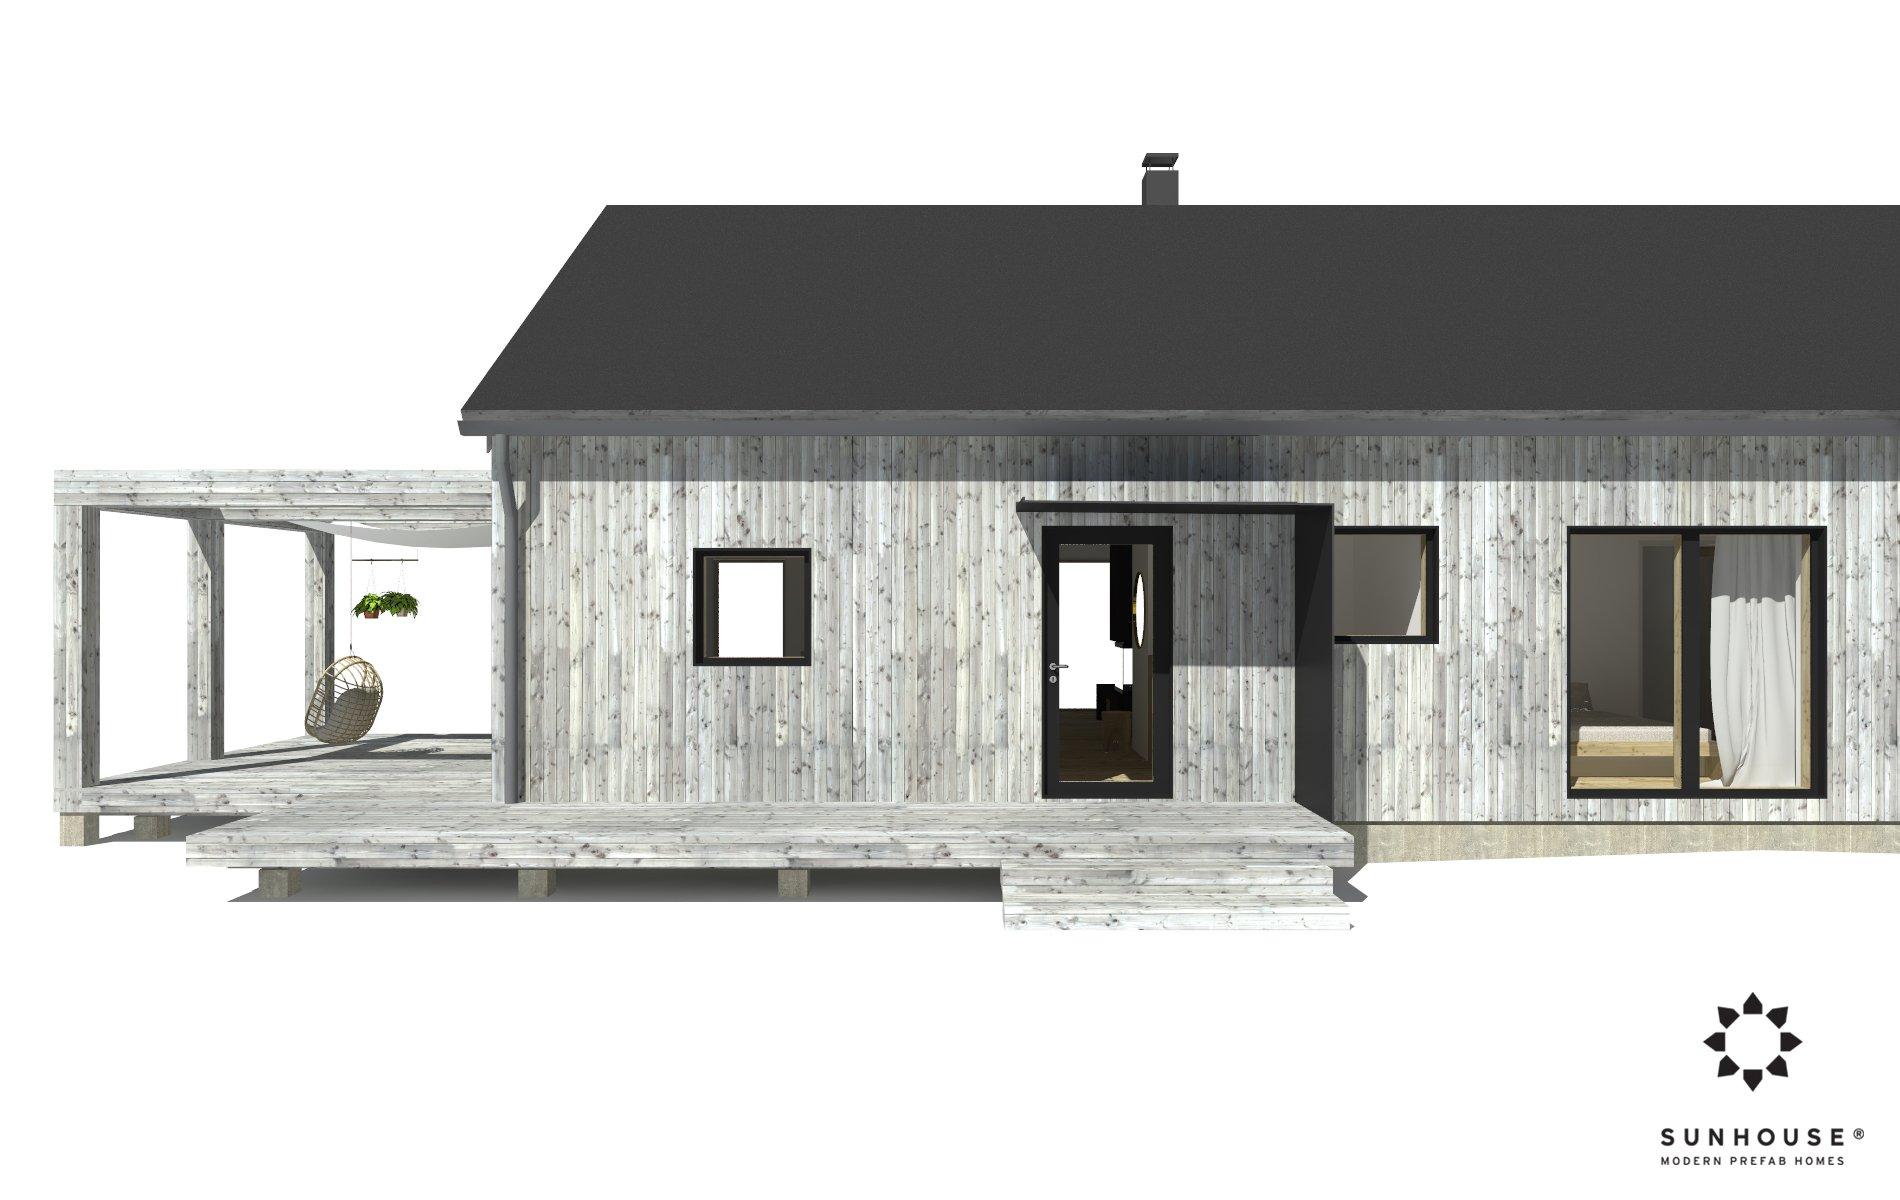 Sunhouse S180137